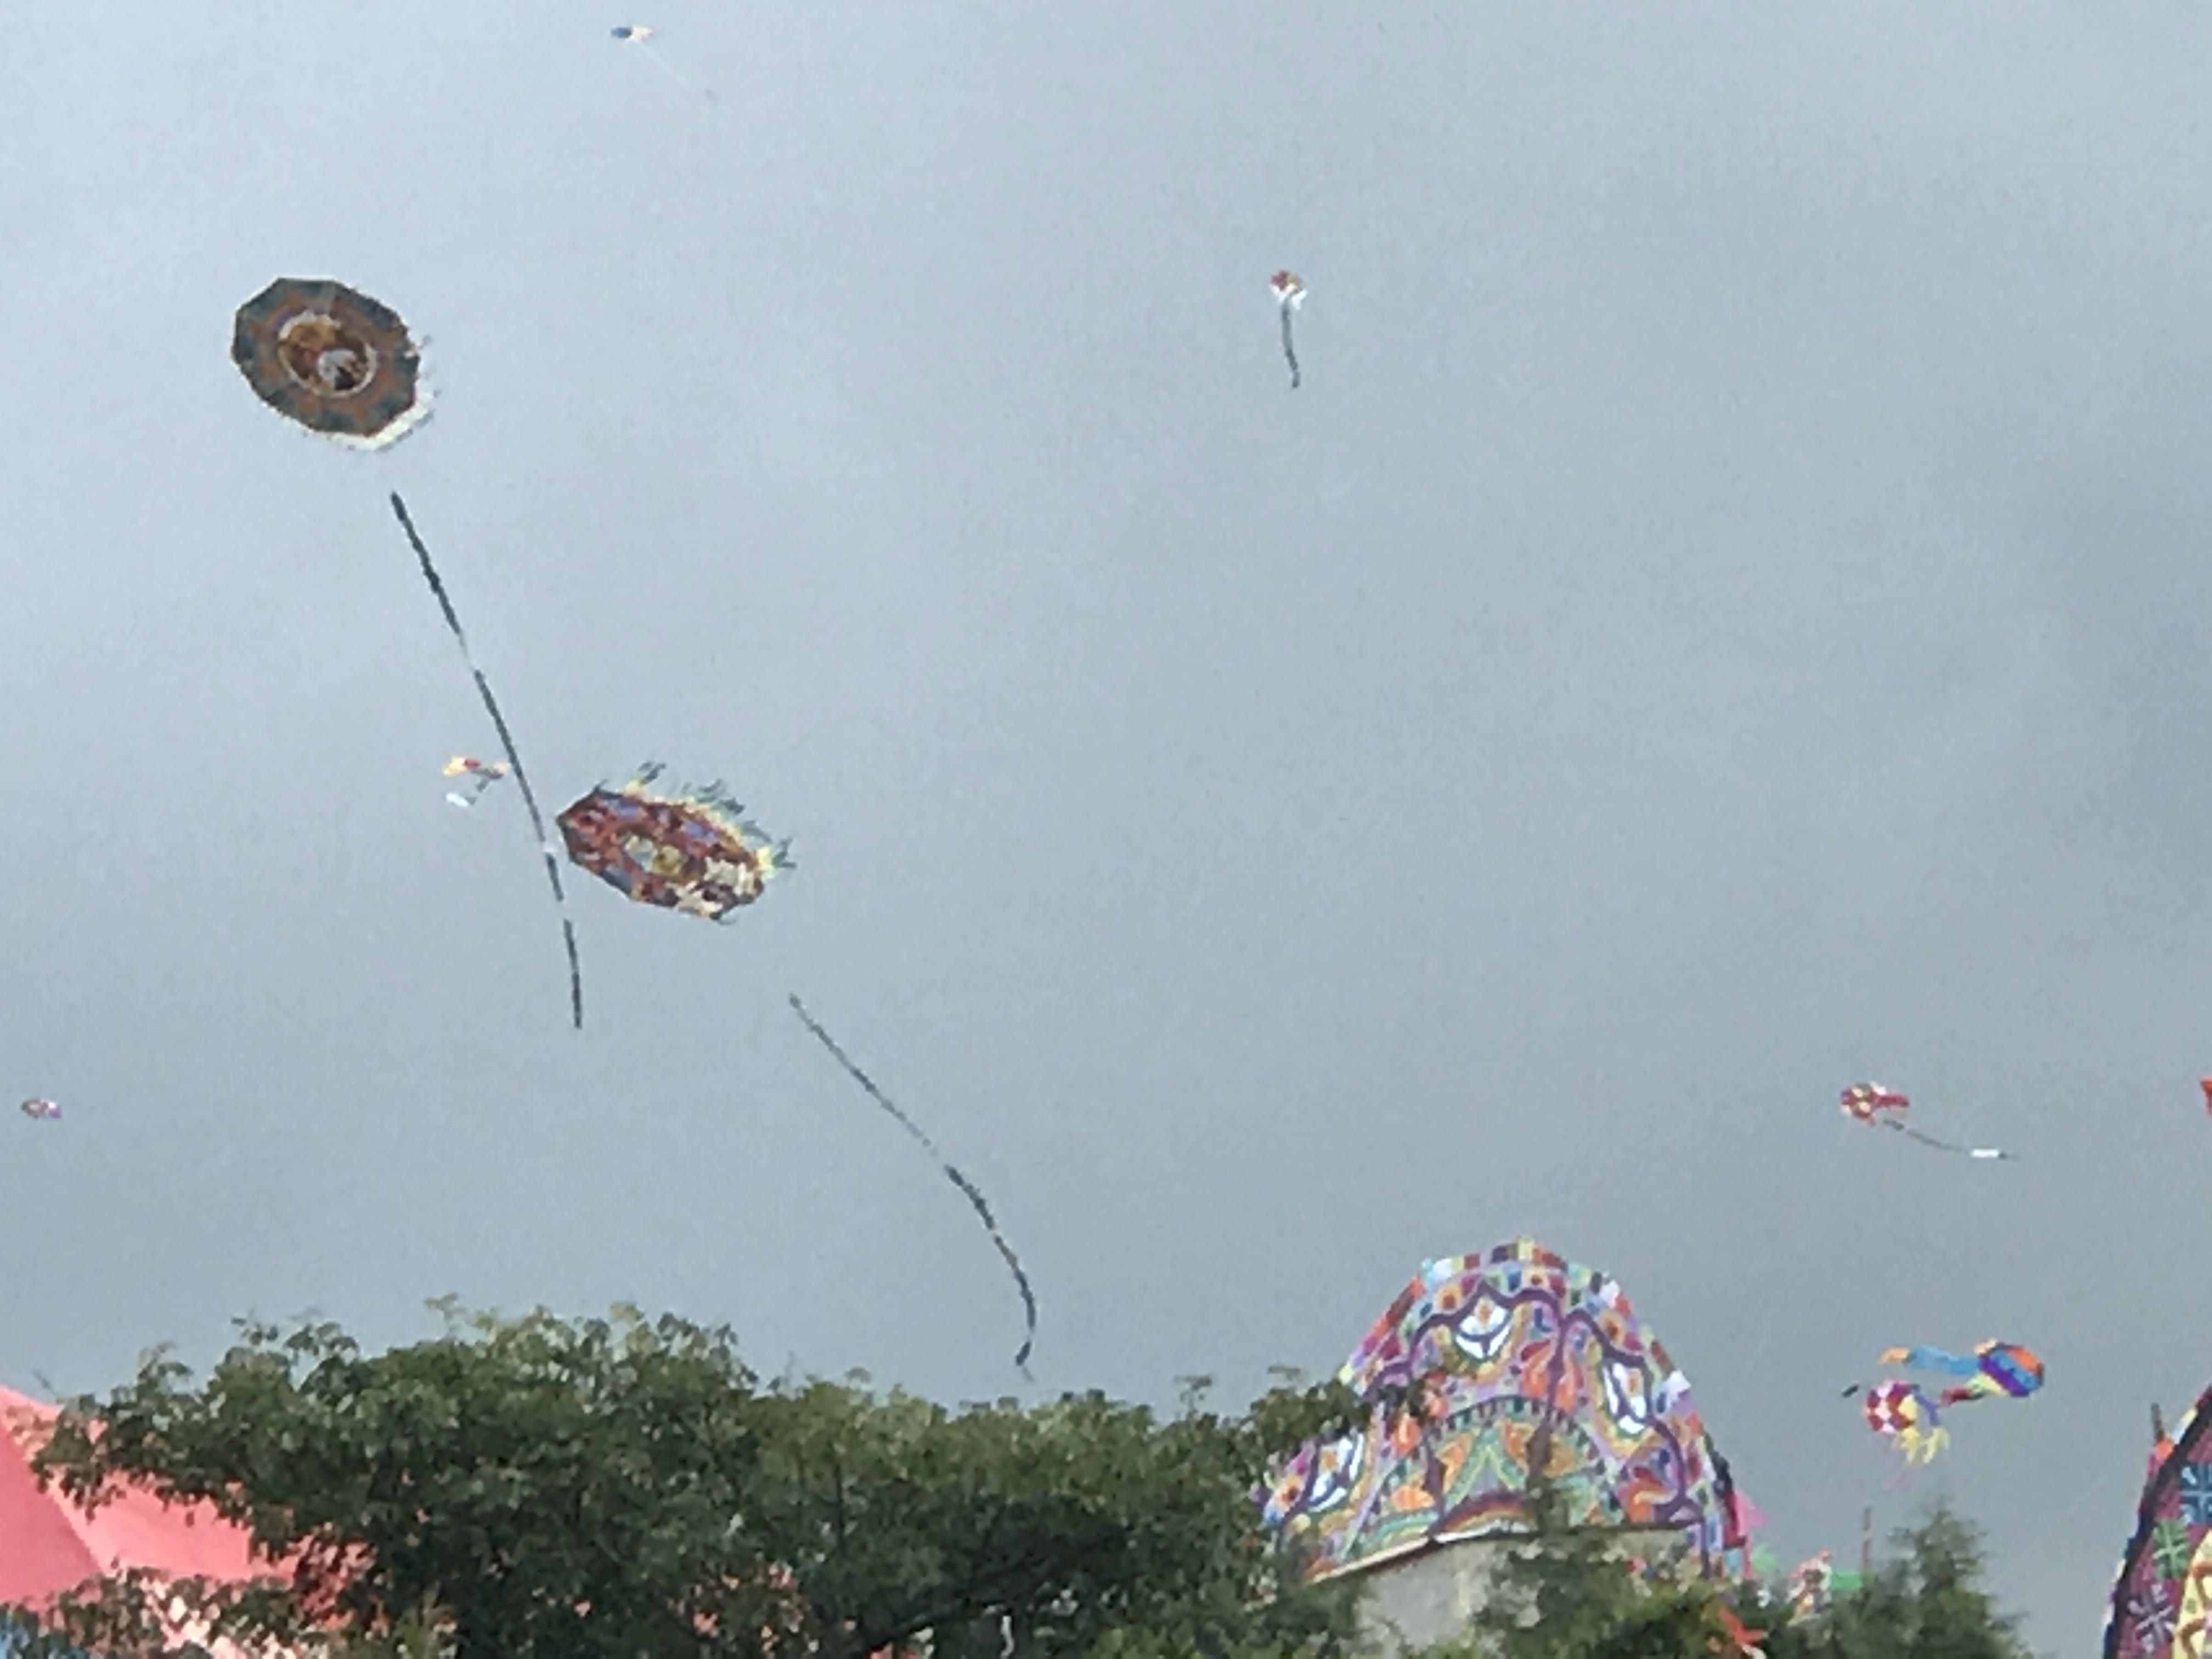 kites 10 foot flyers